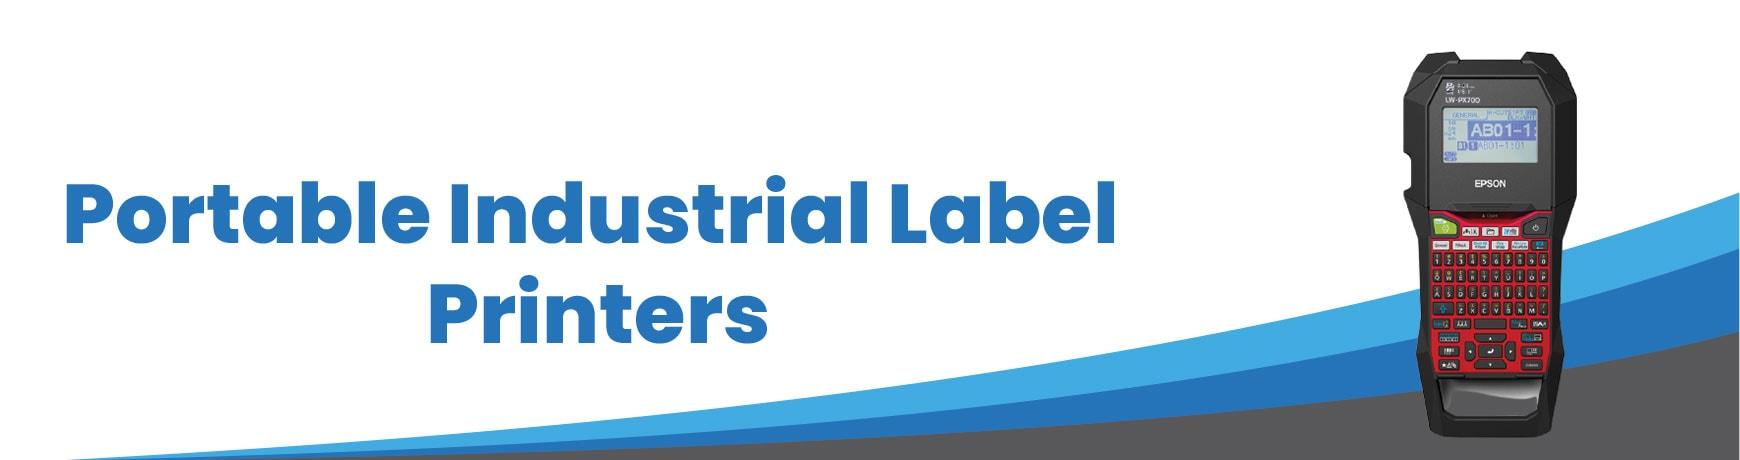 Portable Industrial Label Printers